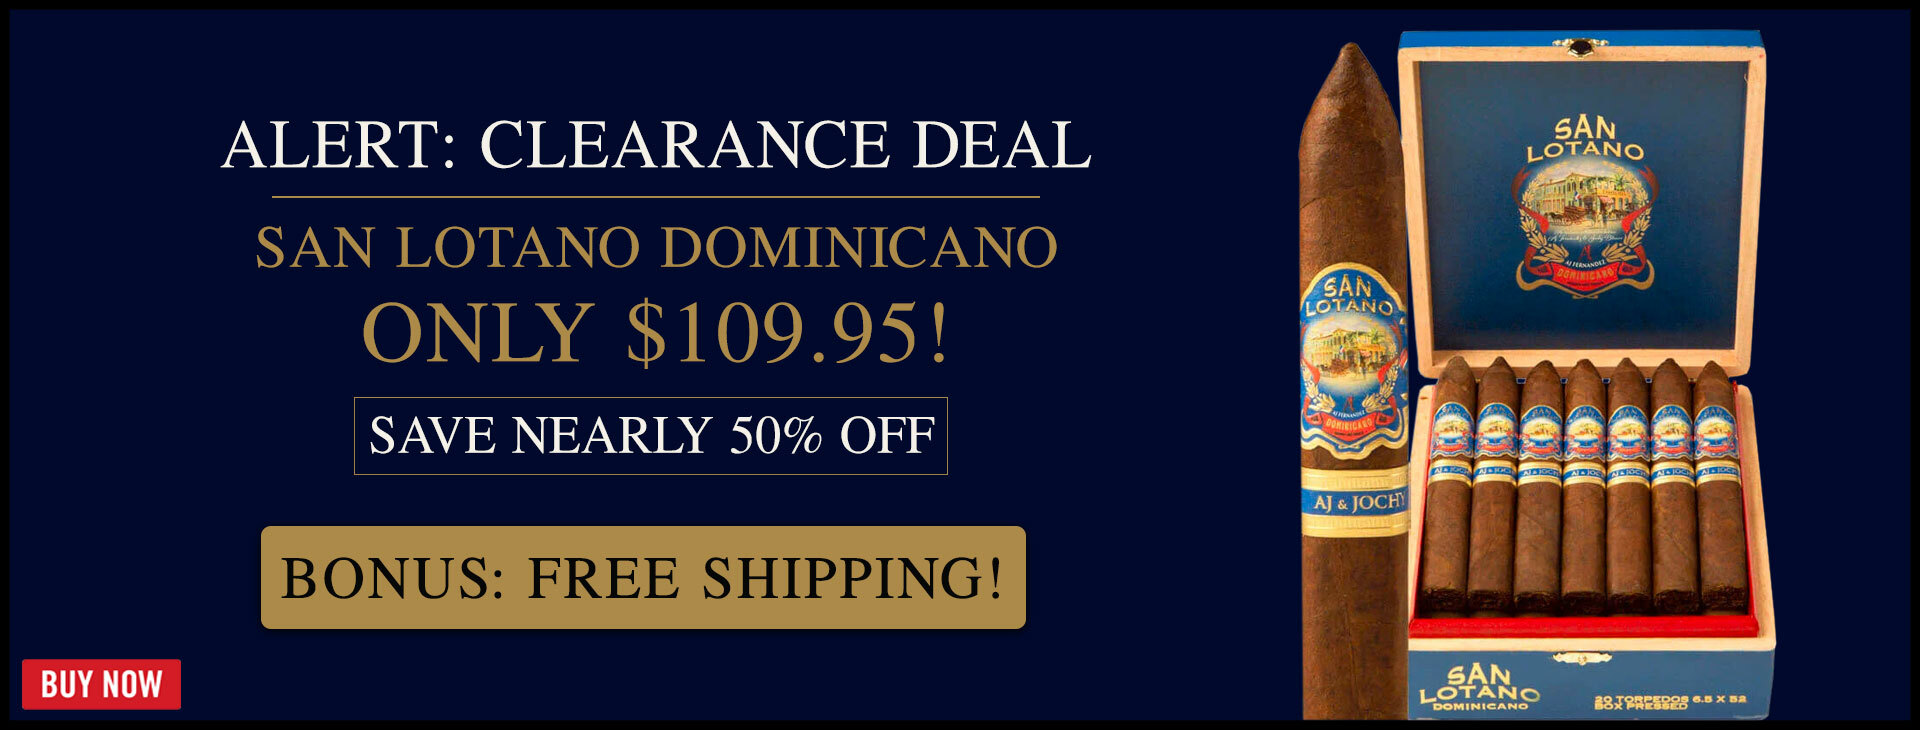 CLEARANCE: 47% OFF SAN LOTANO DOMINICANO